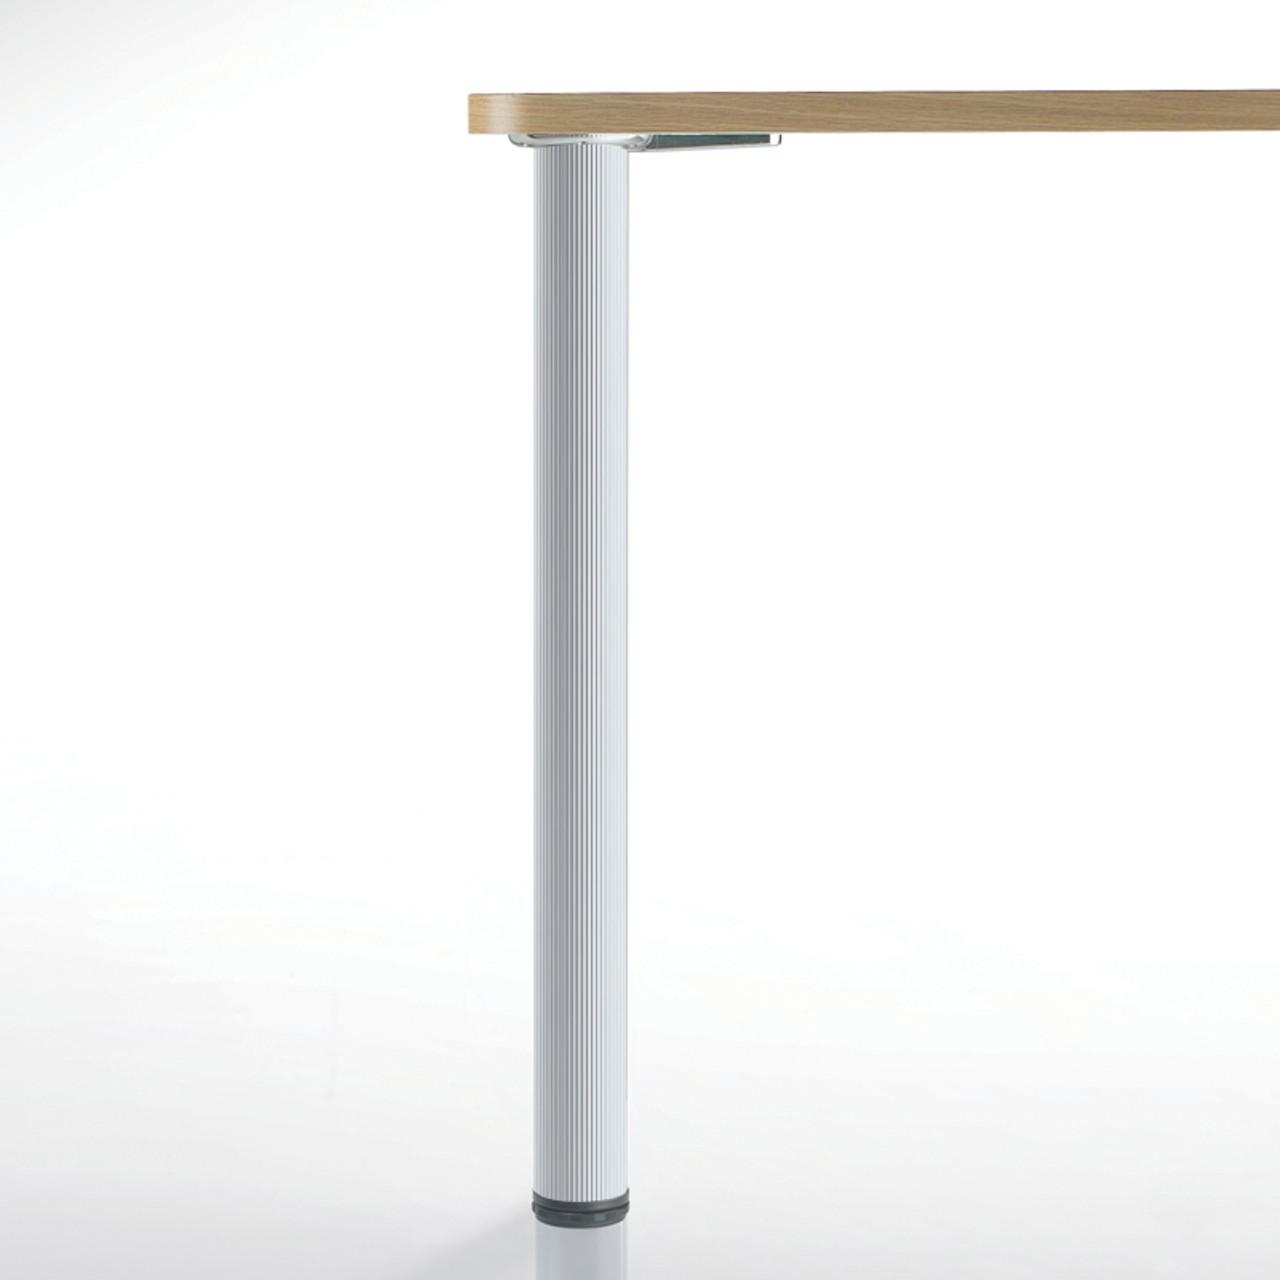 Hamburg Table Leg, Alumina, 34-1/4'', 2-3/8'' diameter leg 1-1/8'' adjustable foot - replacementtablelegs.com